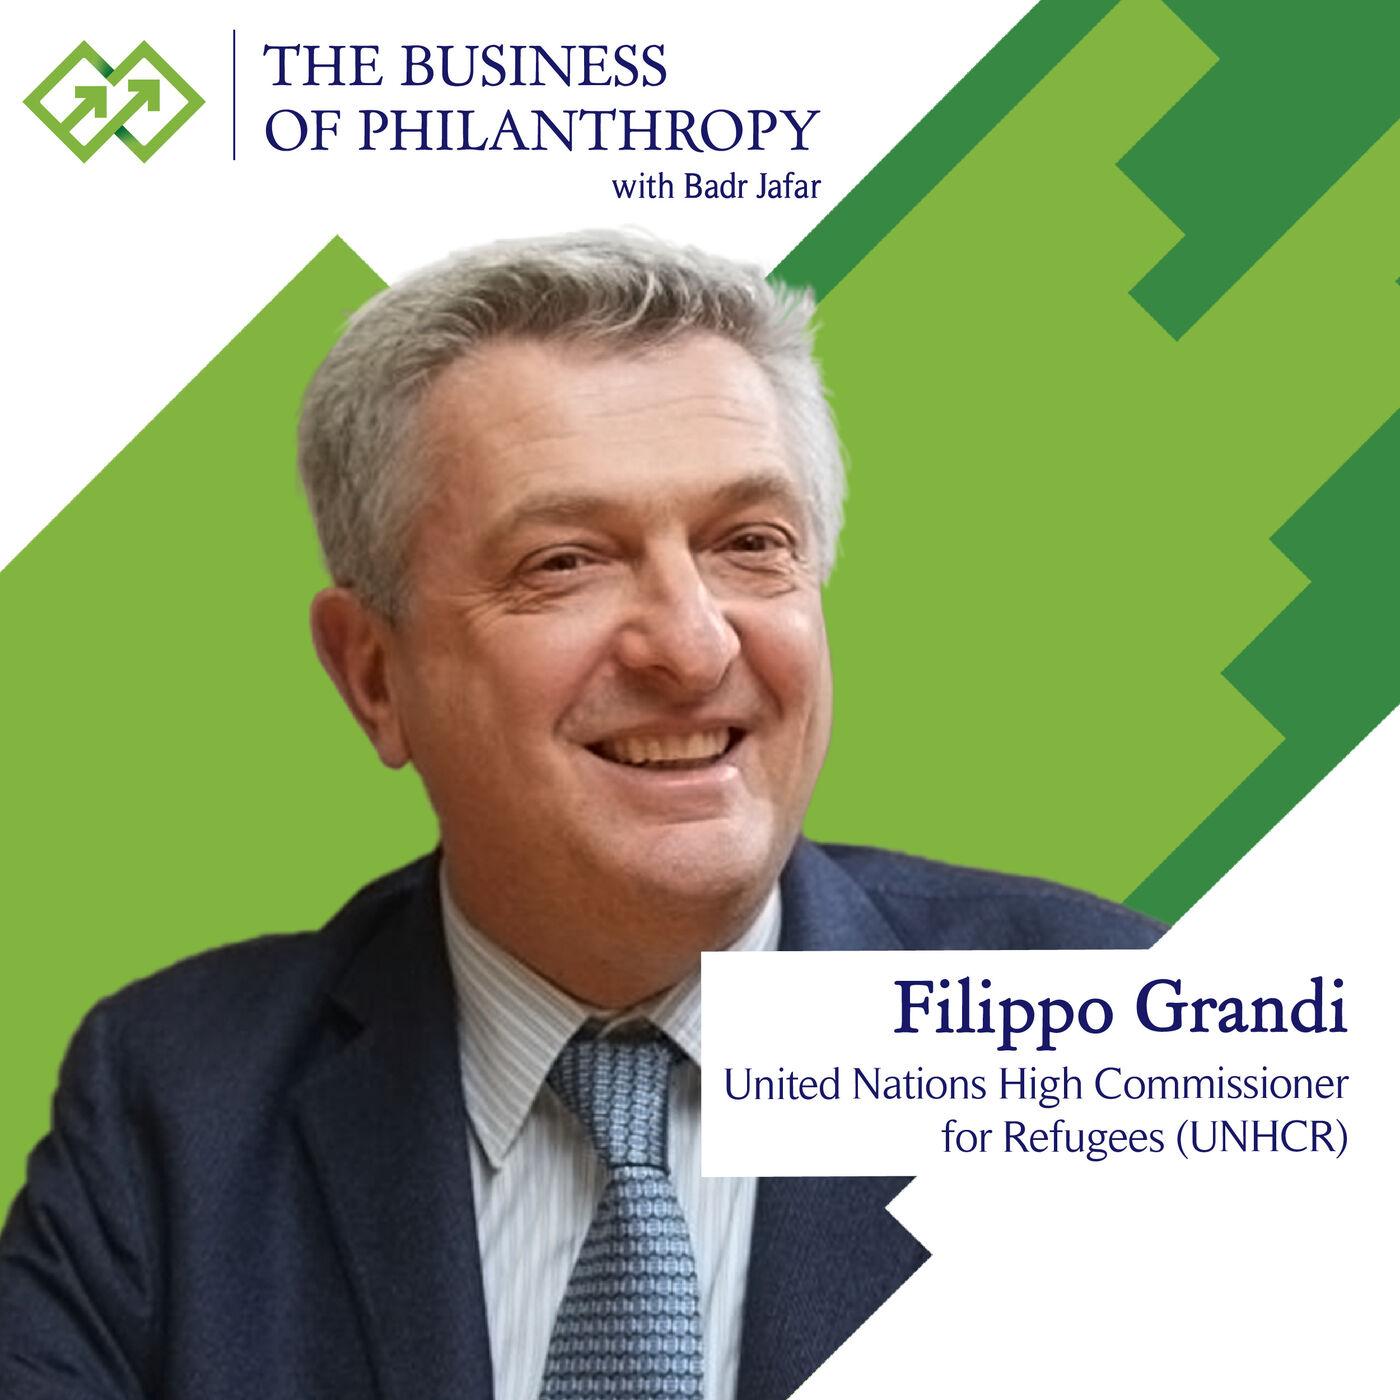 Filippo Grandi; A Conversation with Badr Jafar